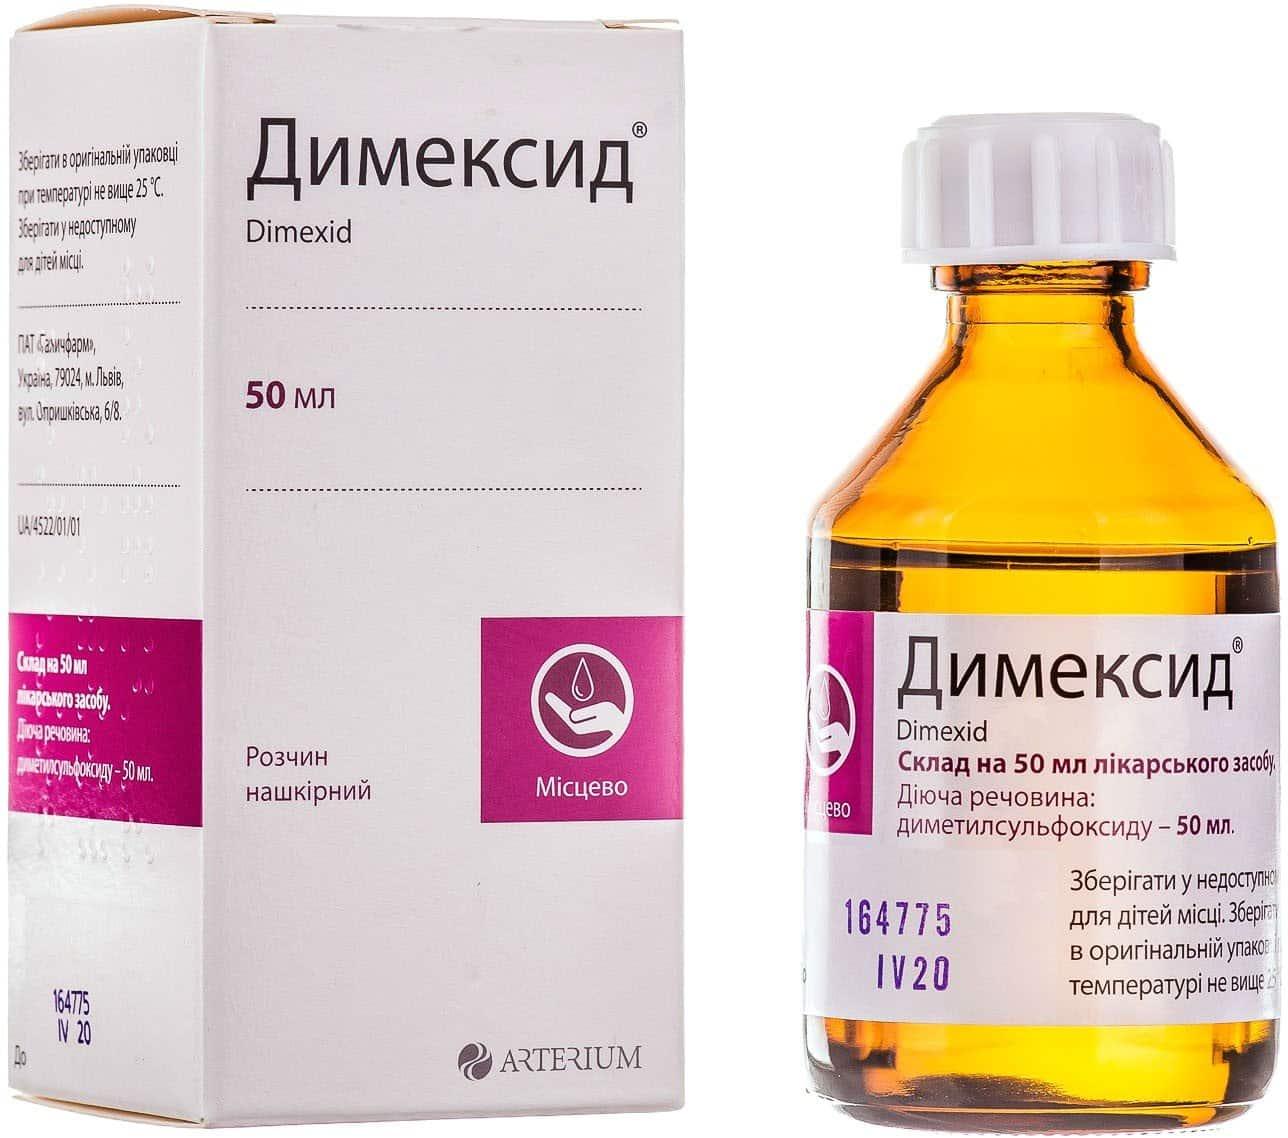 Dimexid (dimexidum) 50 ml.